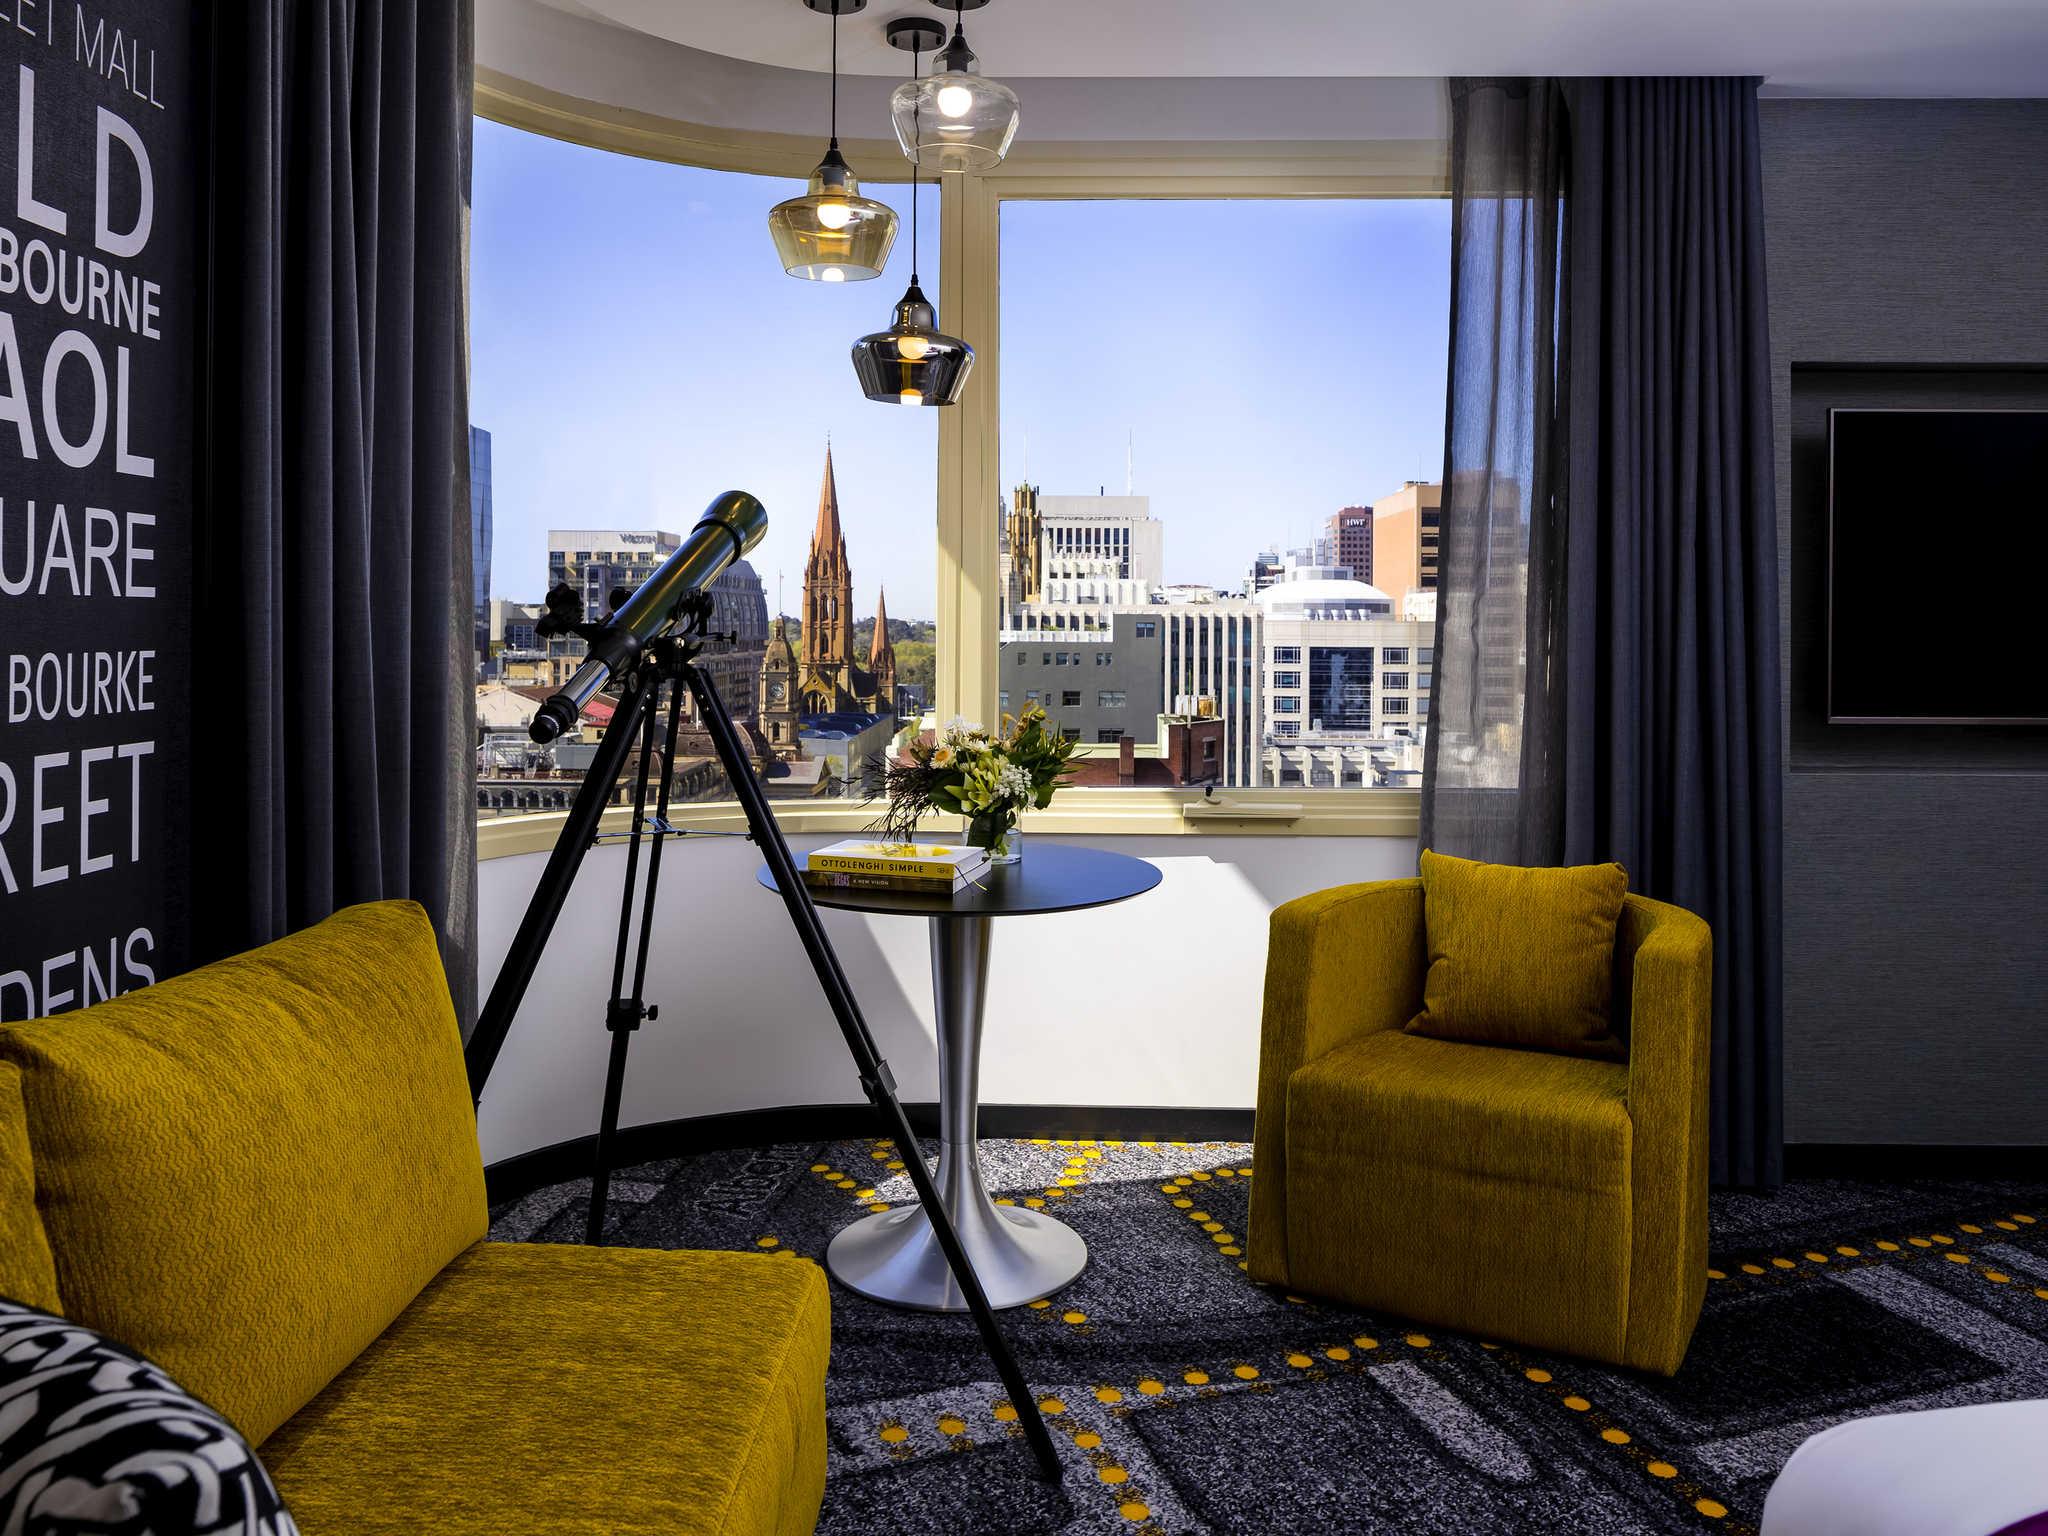 Hôtel - The Swanston Hotel Melbourne Grand Mercure